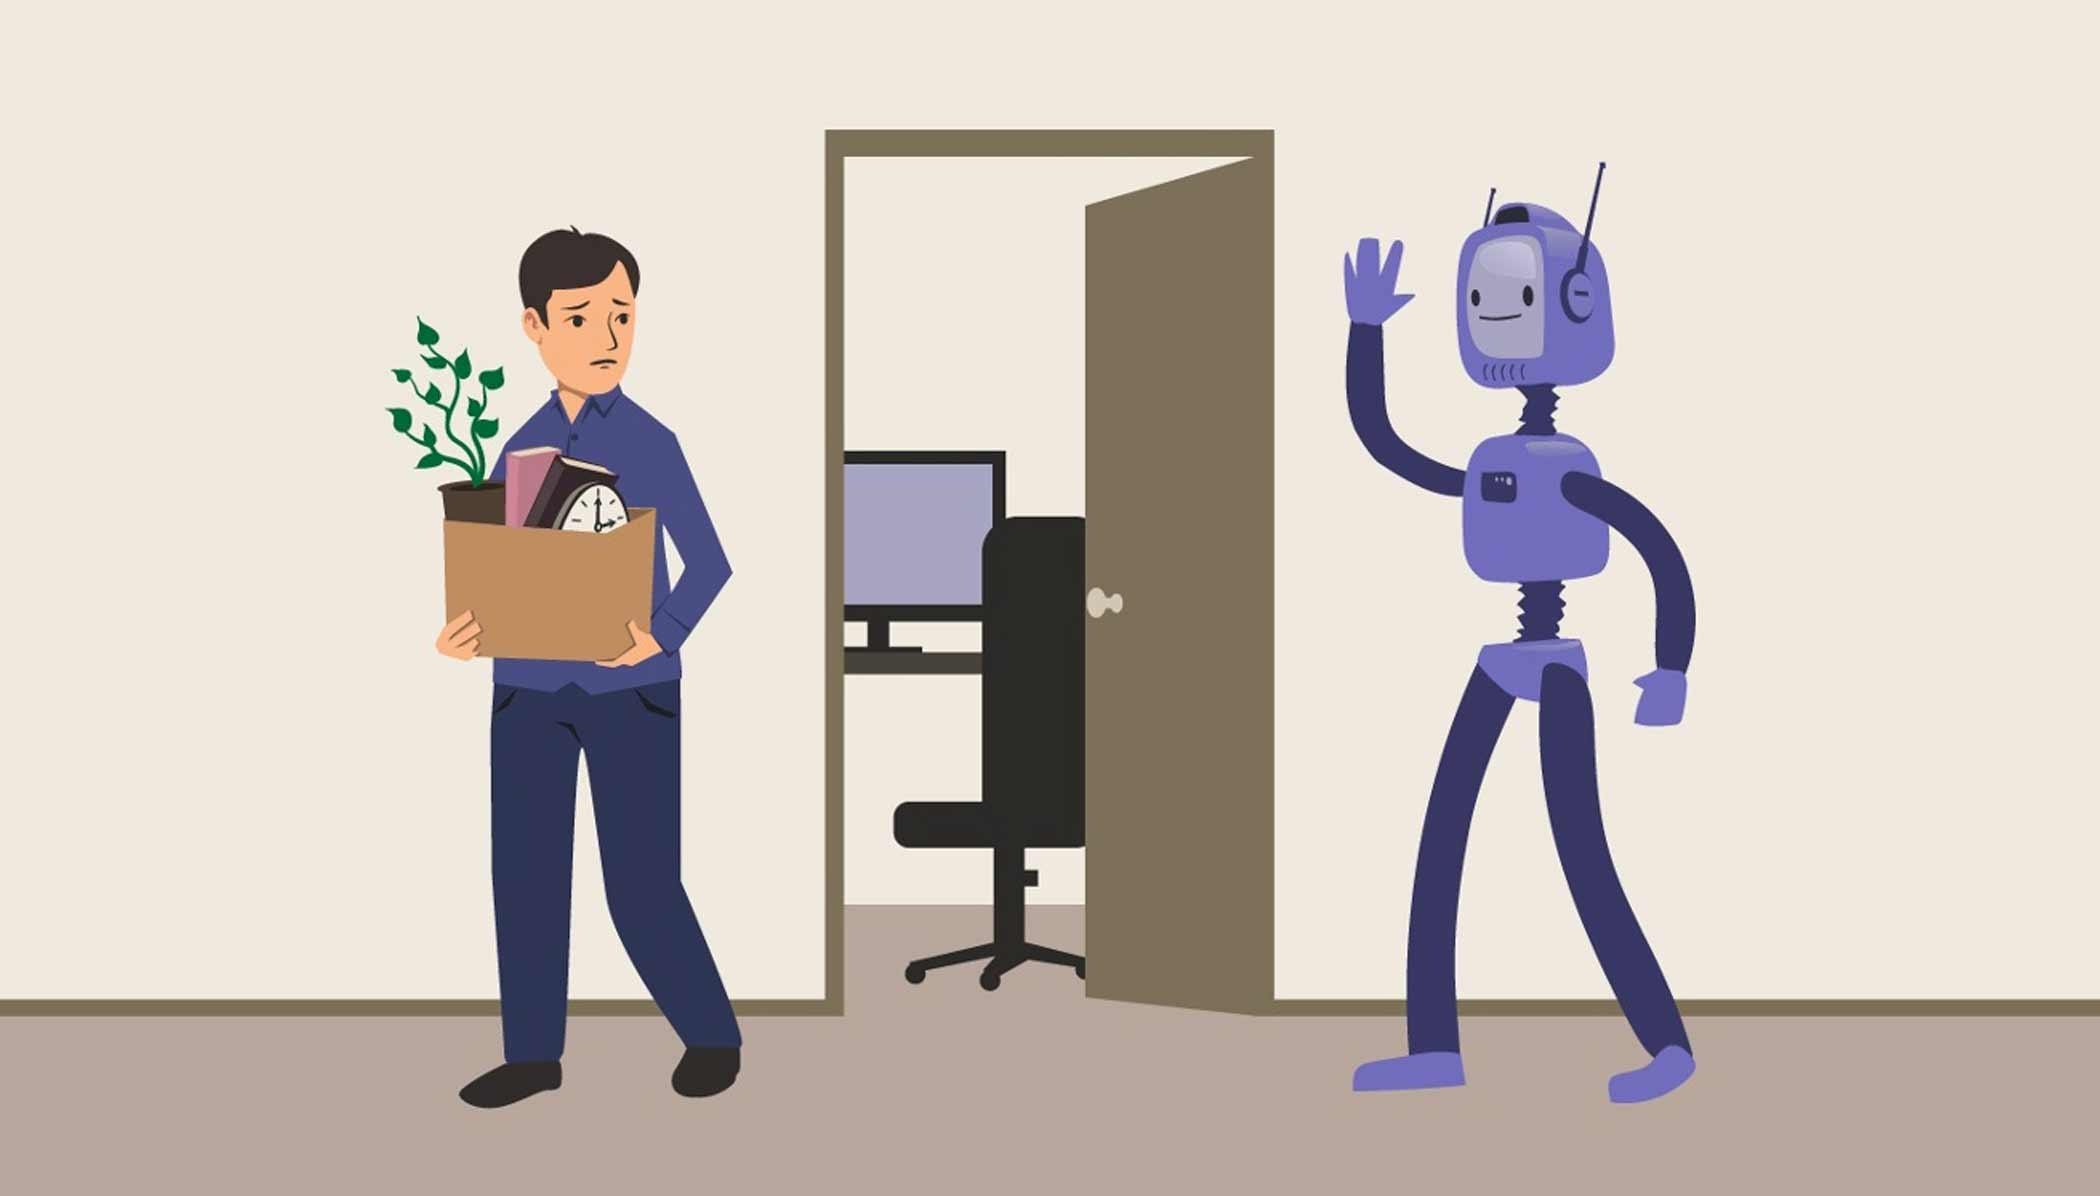 Robot replacing Human Resources Professional.